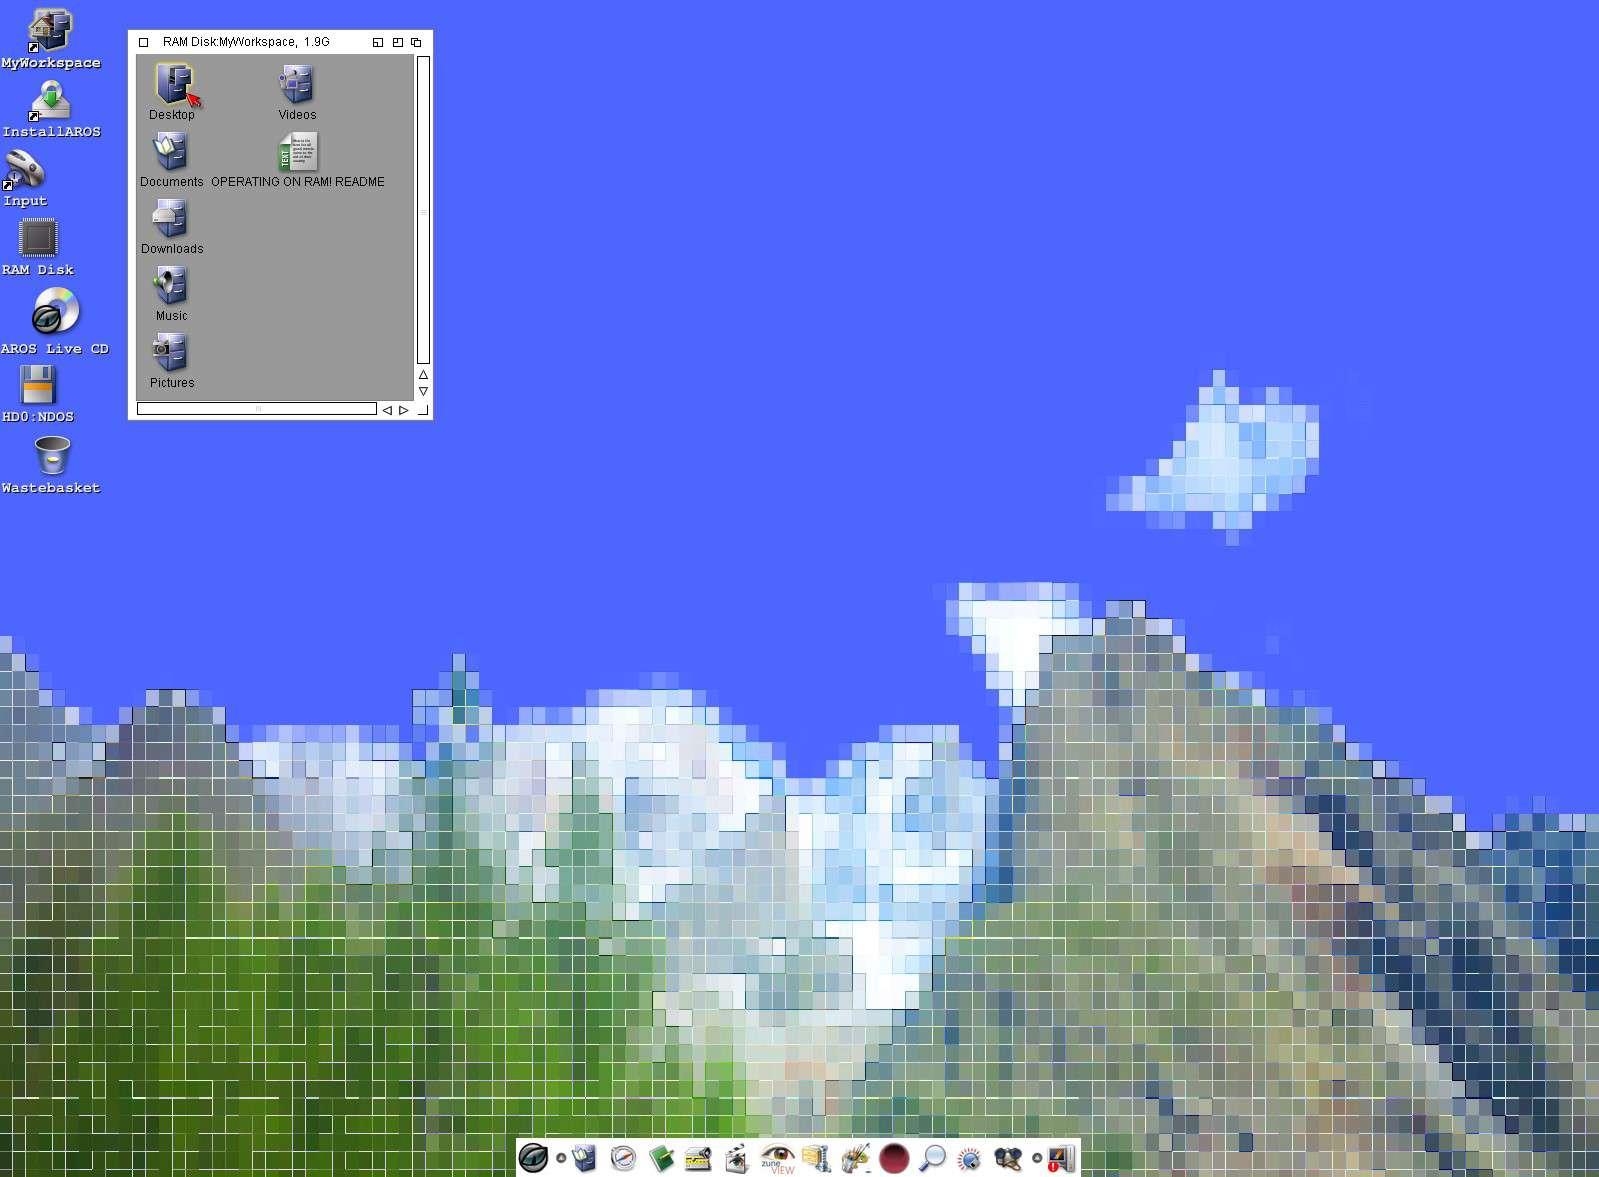 The Icaros Desktop